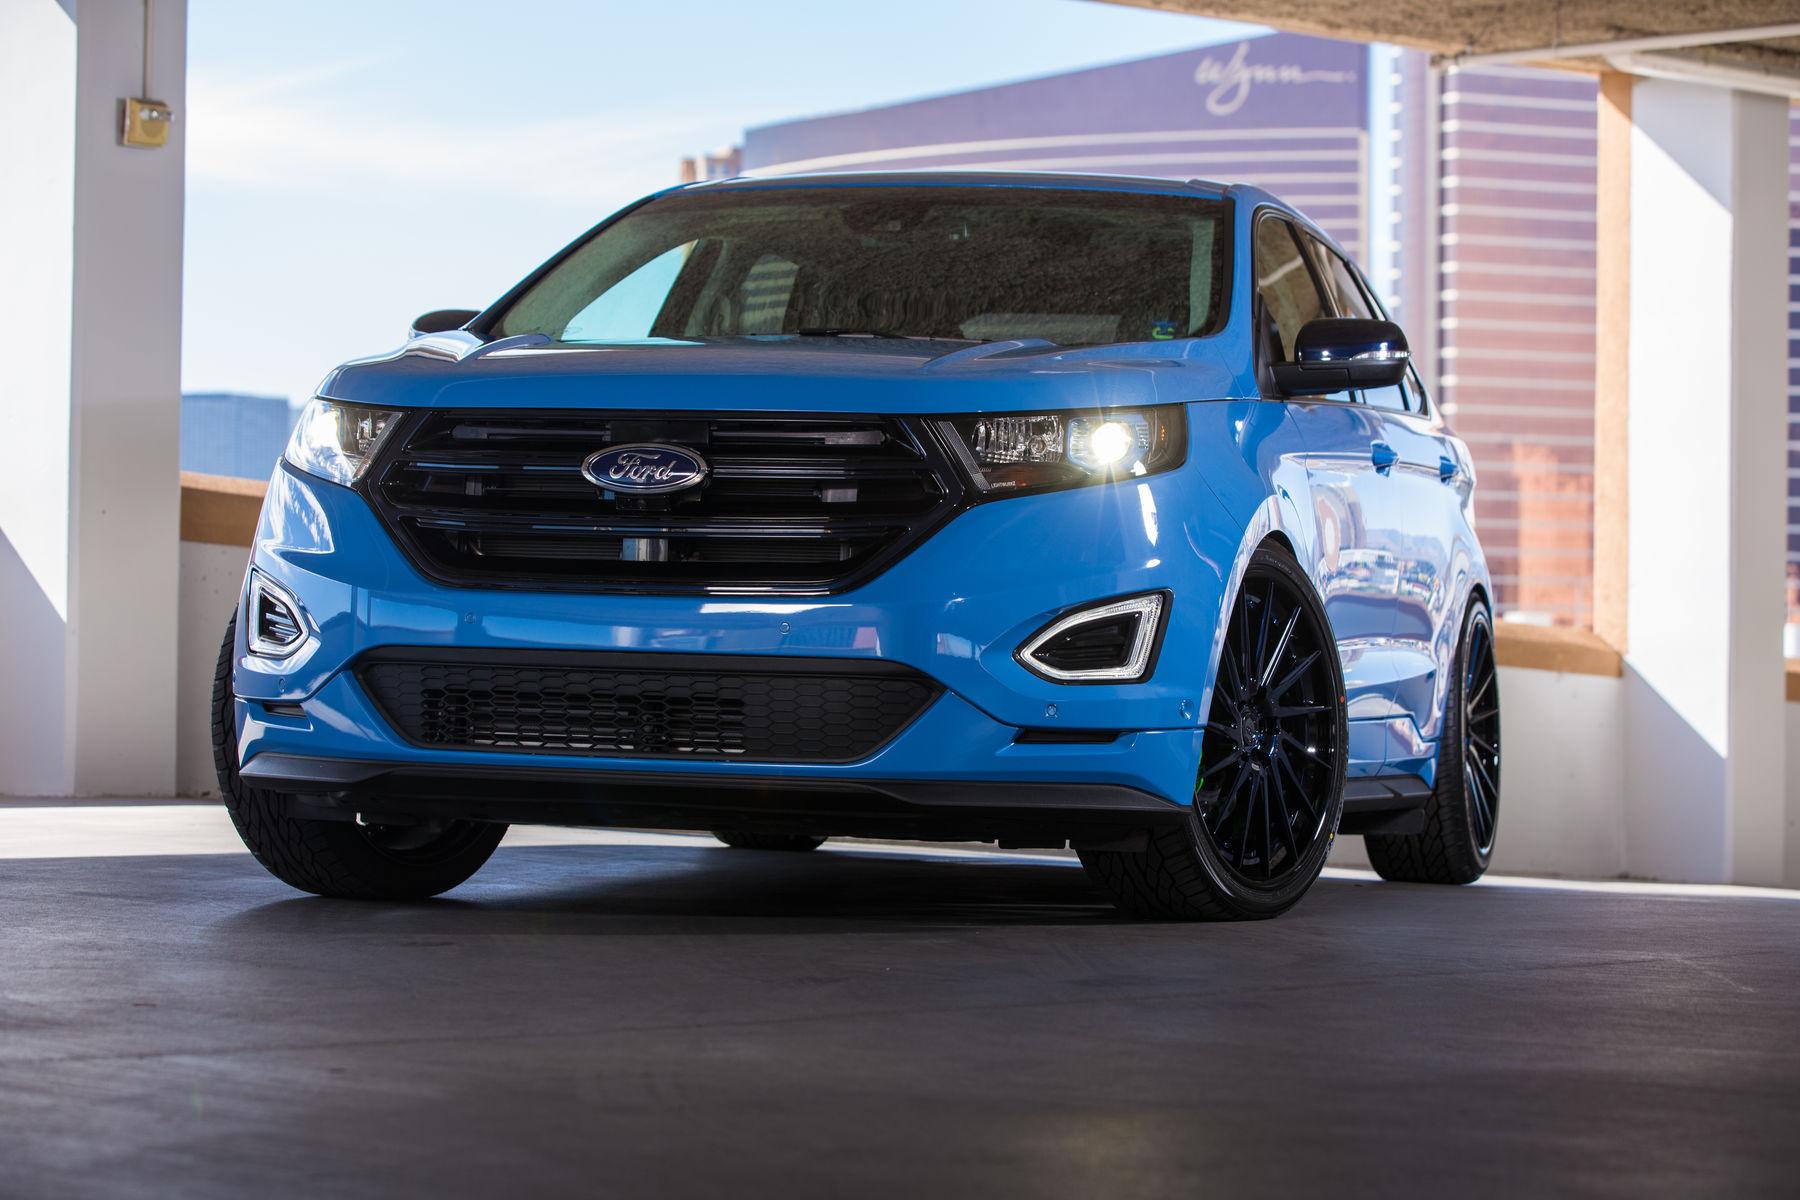 2015 Ford Edge | 2015 Tijn Ford Edge Sport - Front Profile